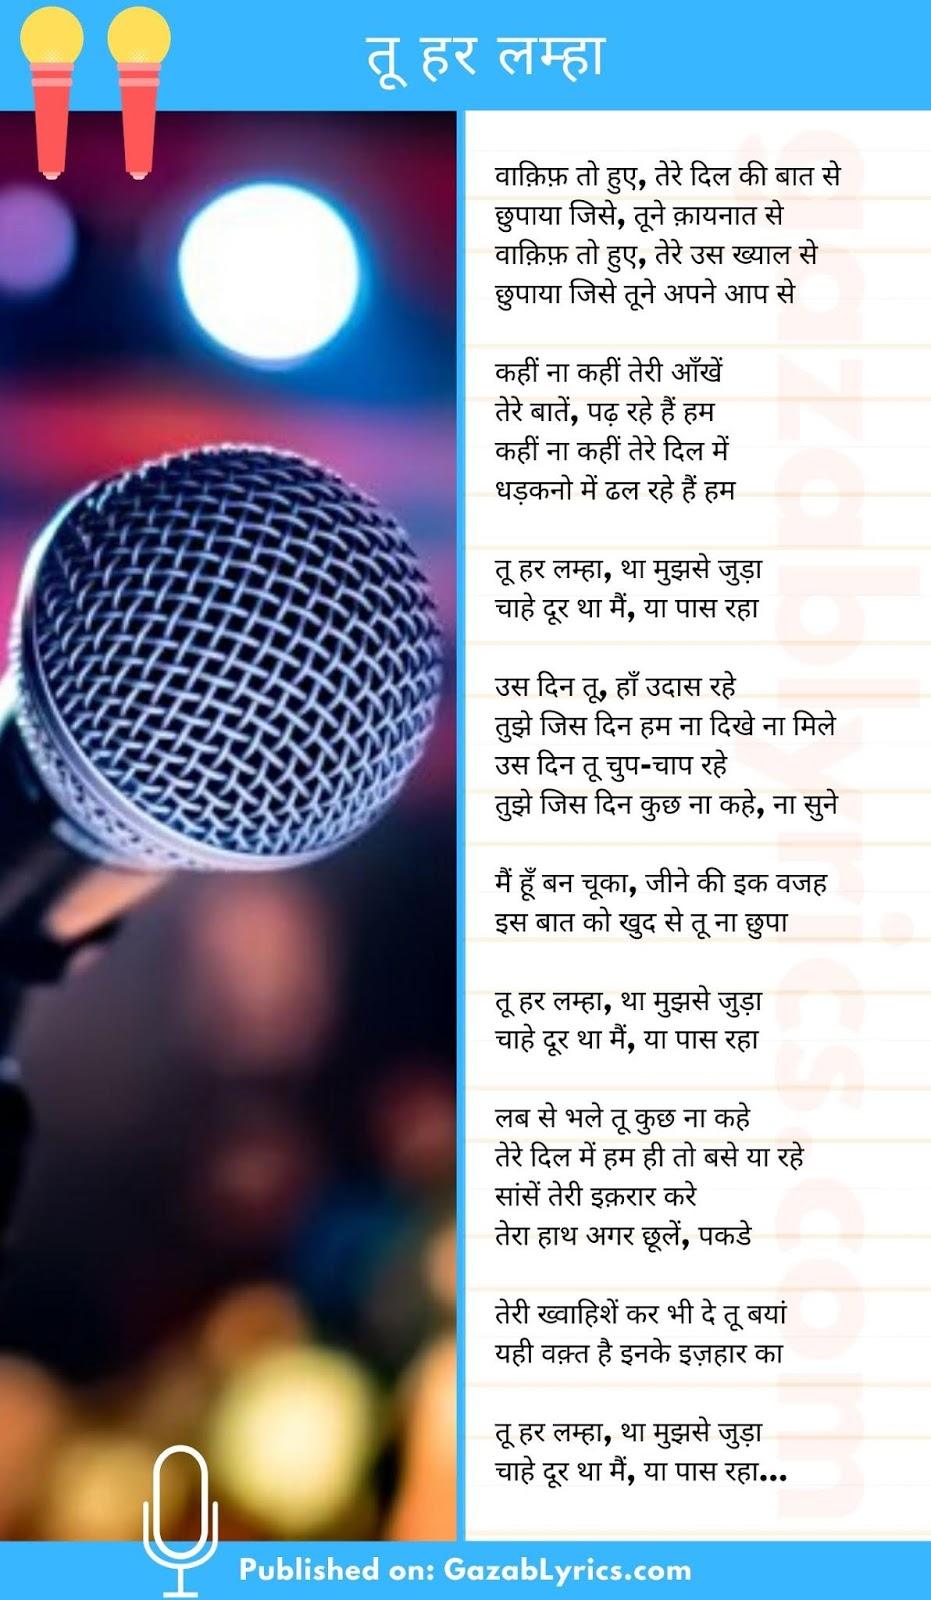 Tu Har Lamha song lyrics image